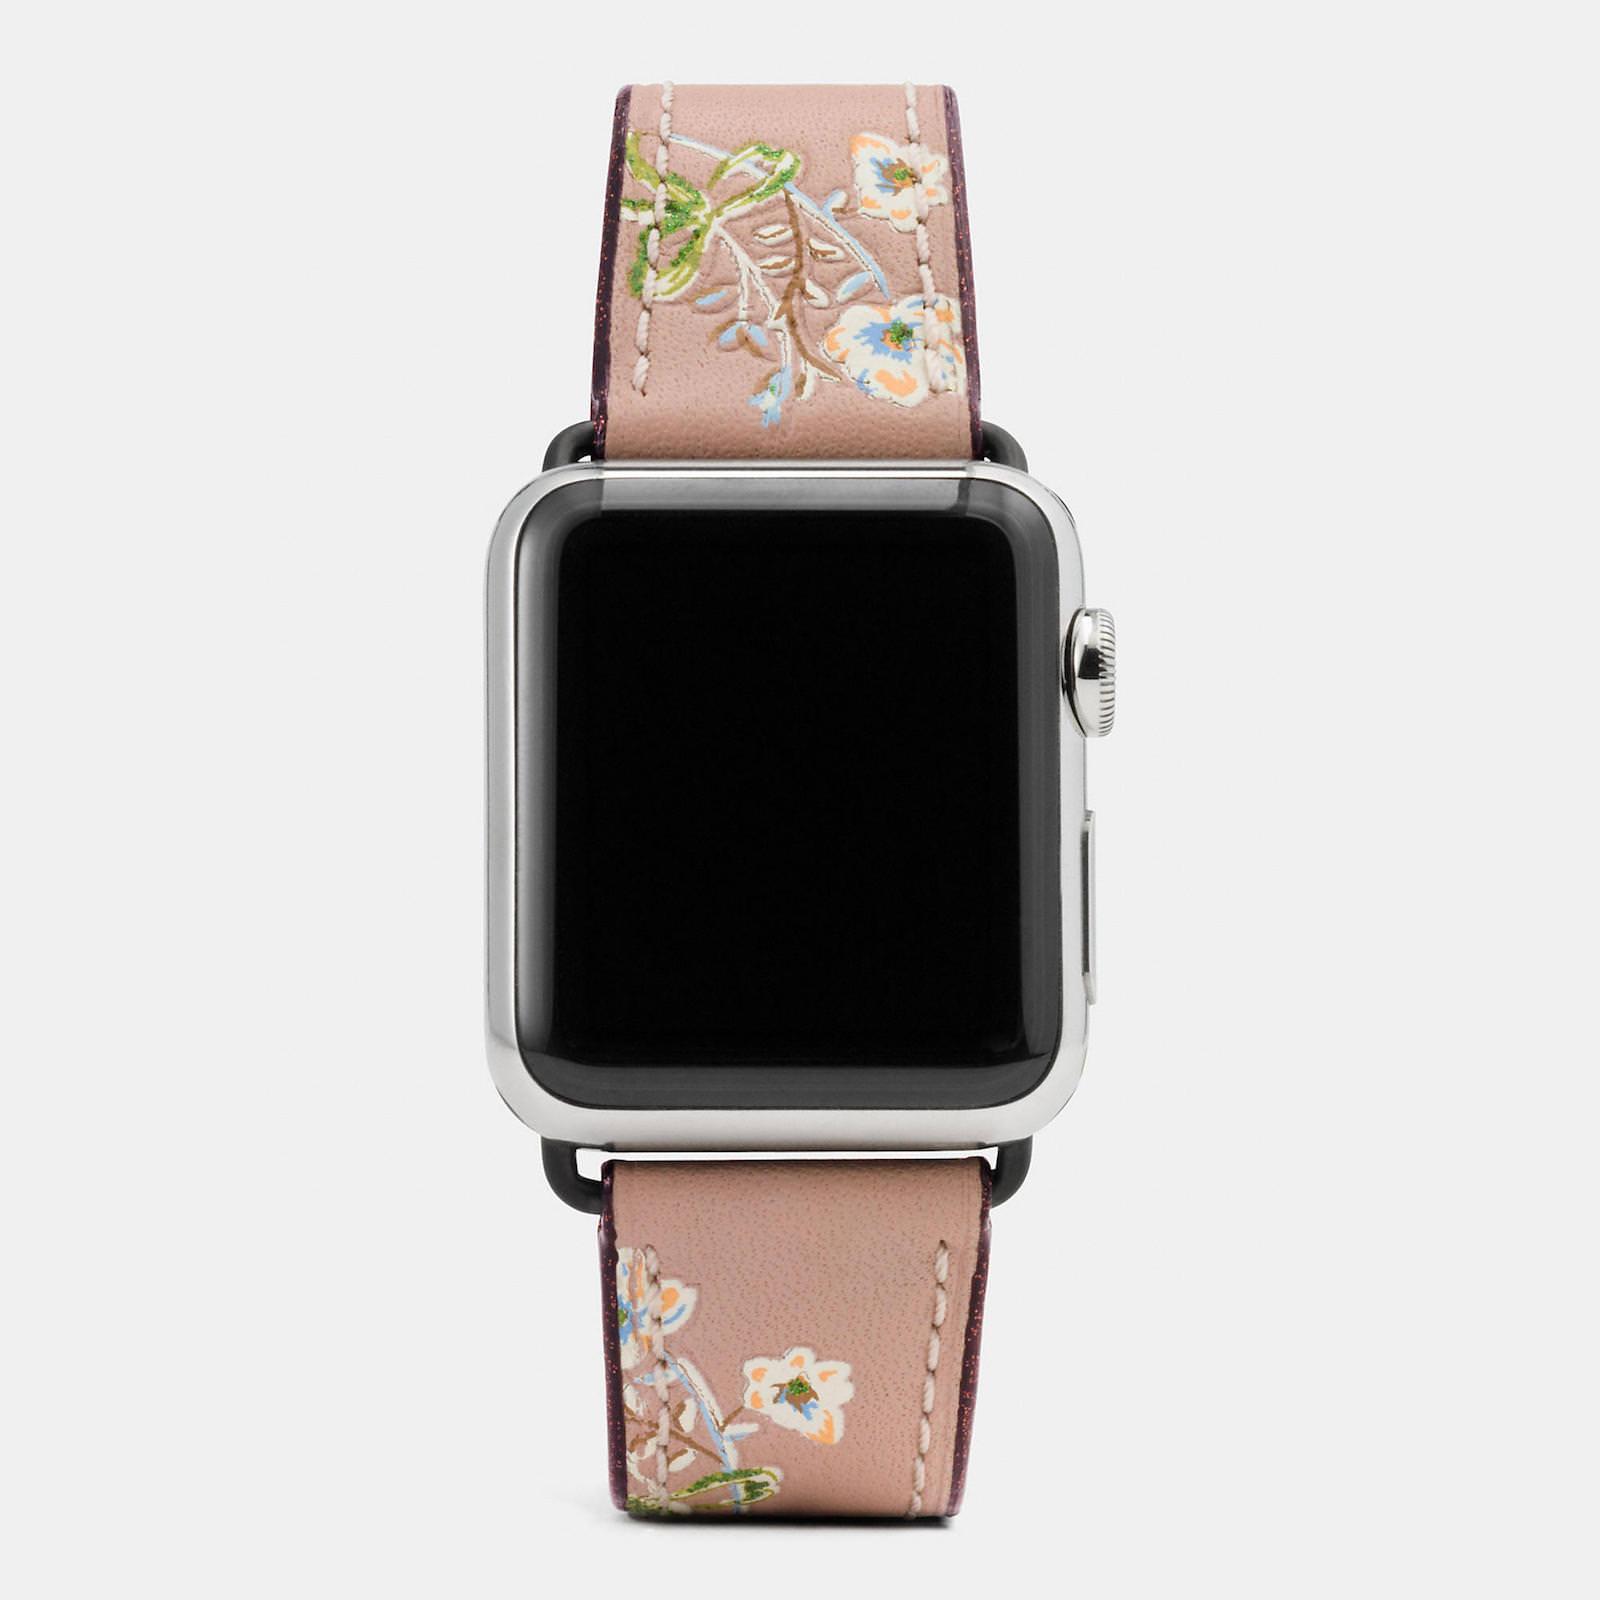 Apple-Watch-Coach-Band-Autumn-Season-6.jpeg